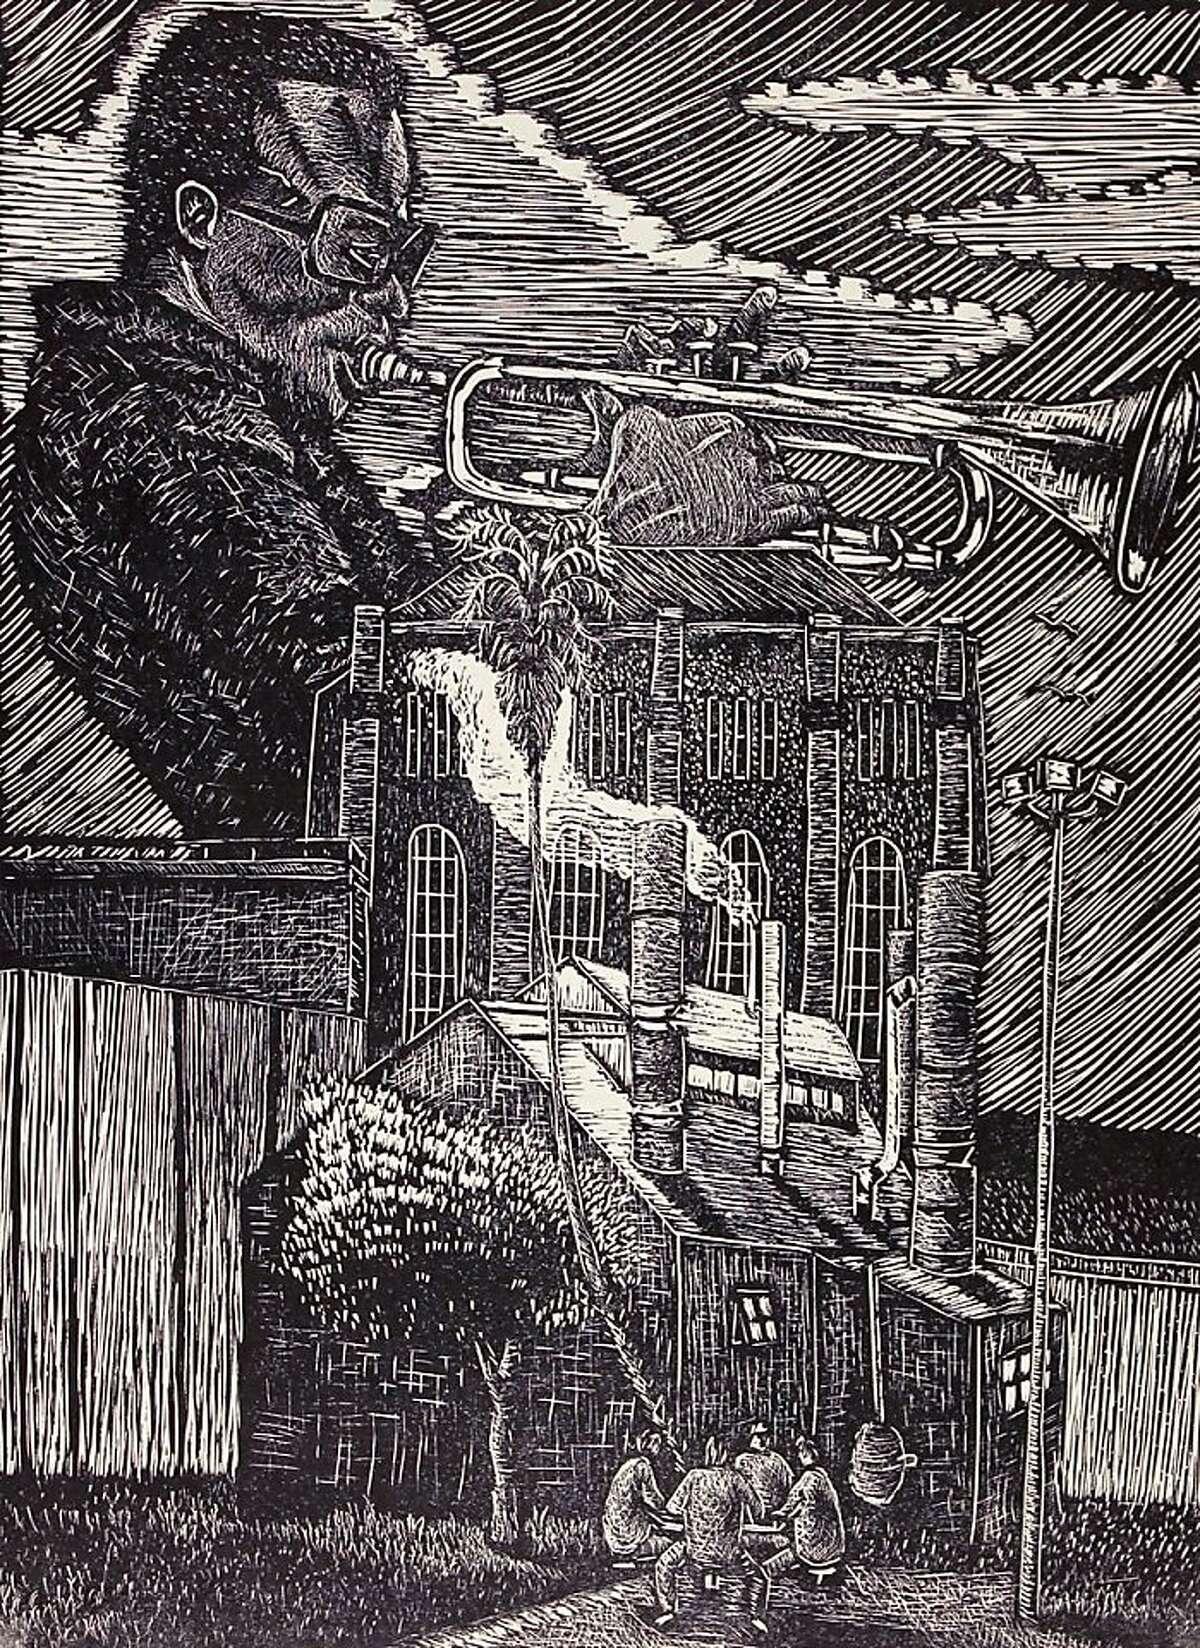 Ronnie Goodman's artwork done while a prisoner at San Quentin.